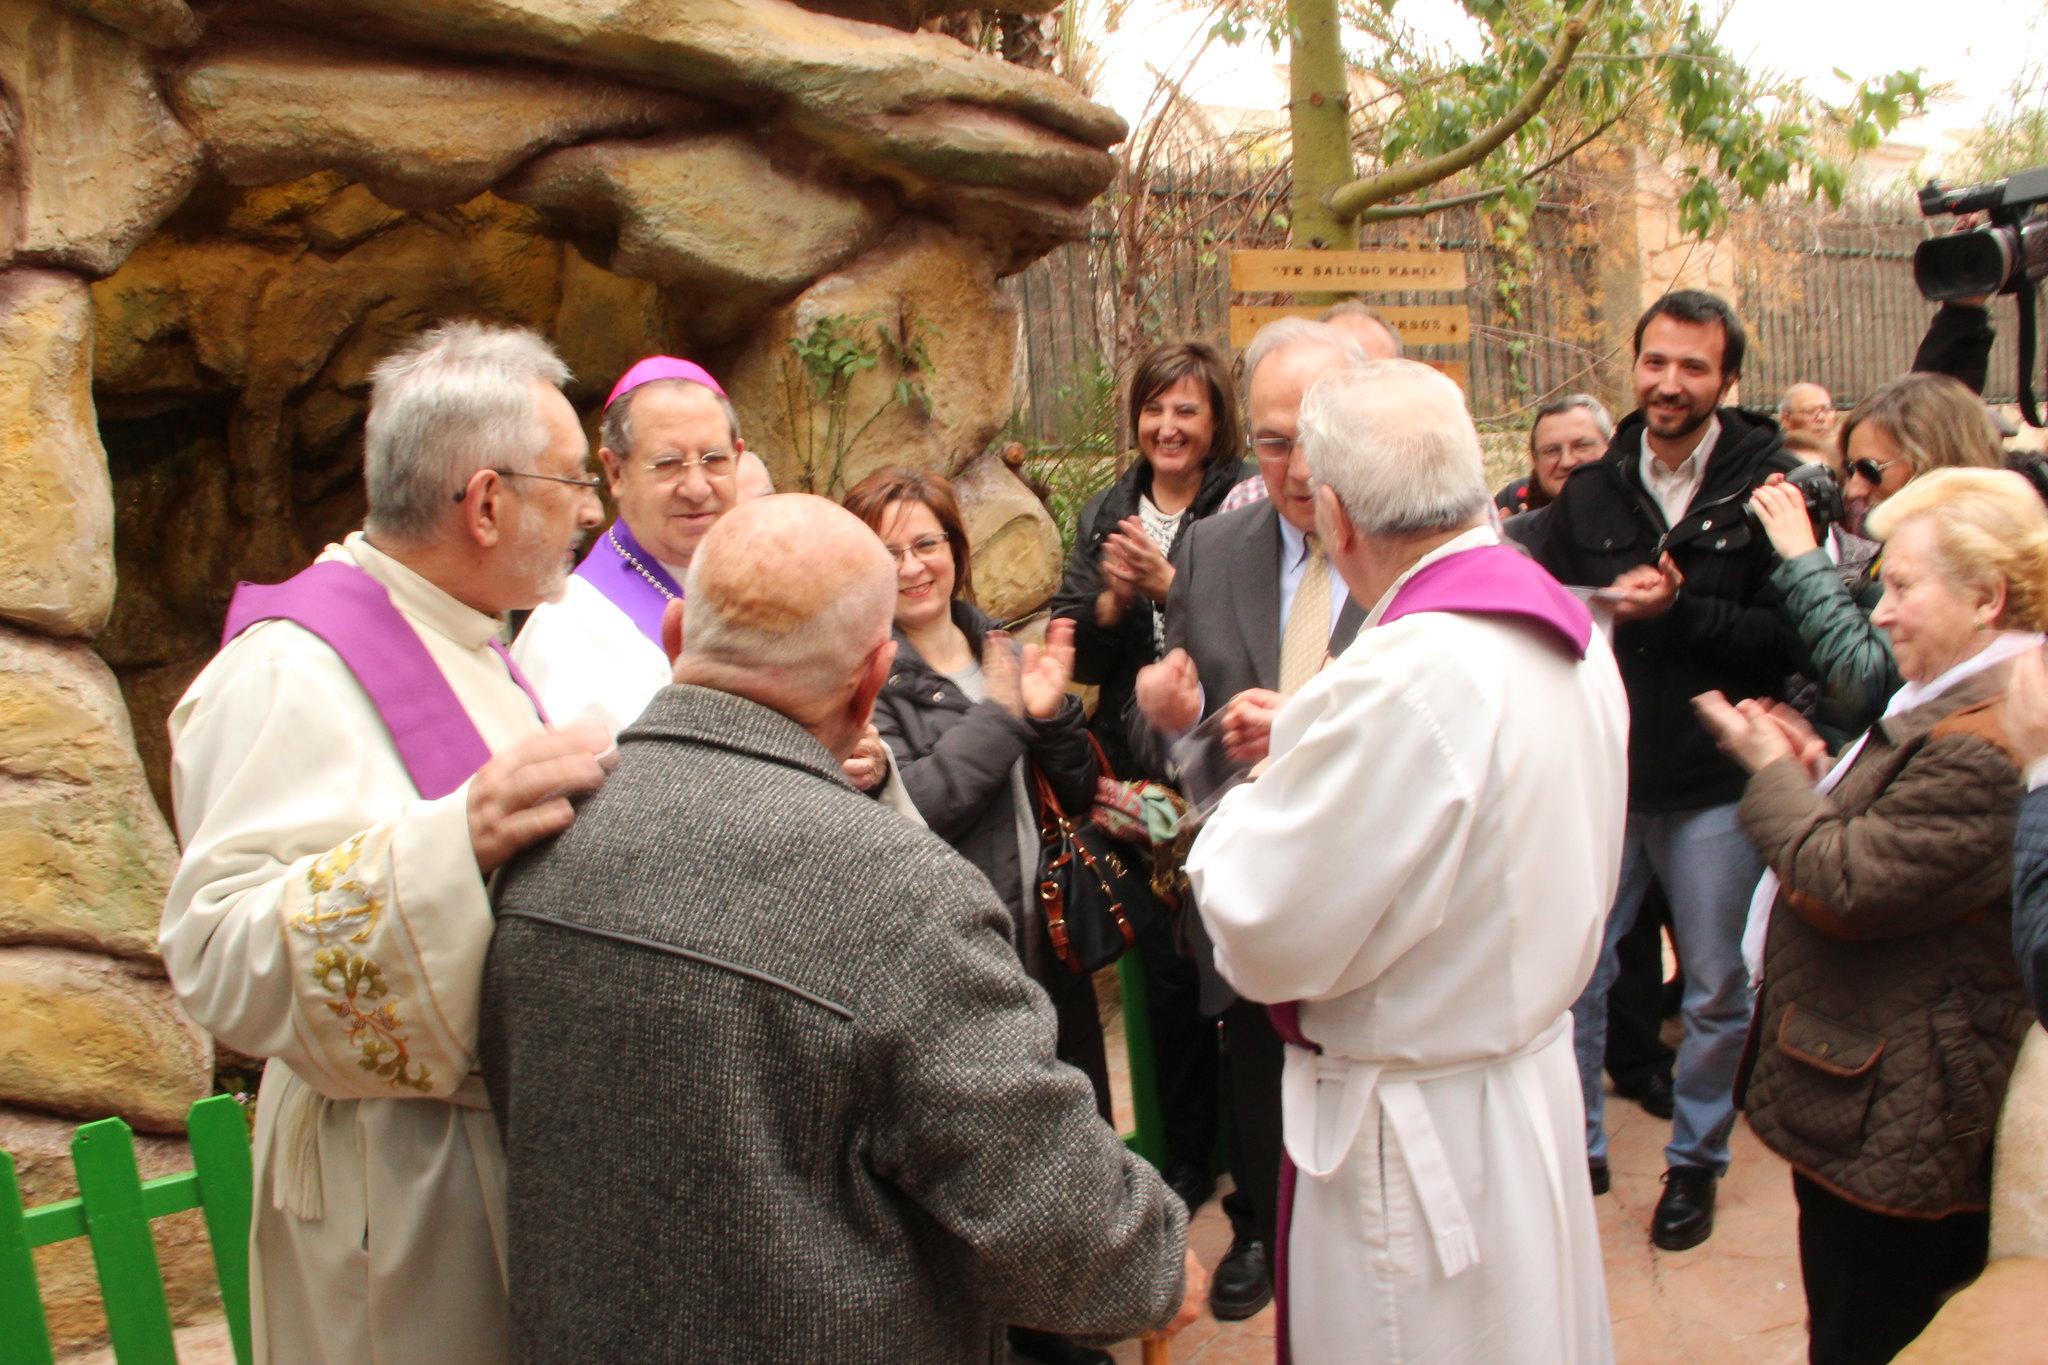 (2016-02-13) - Inauguración Virgen De Lourdes, La Molineta - Archivo La Molineta (087)